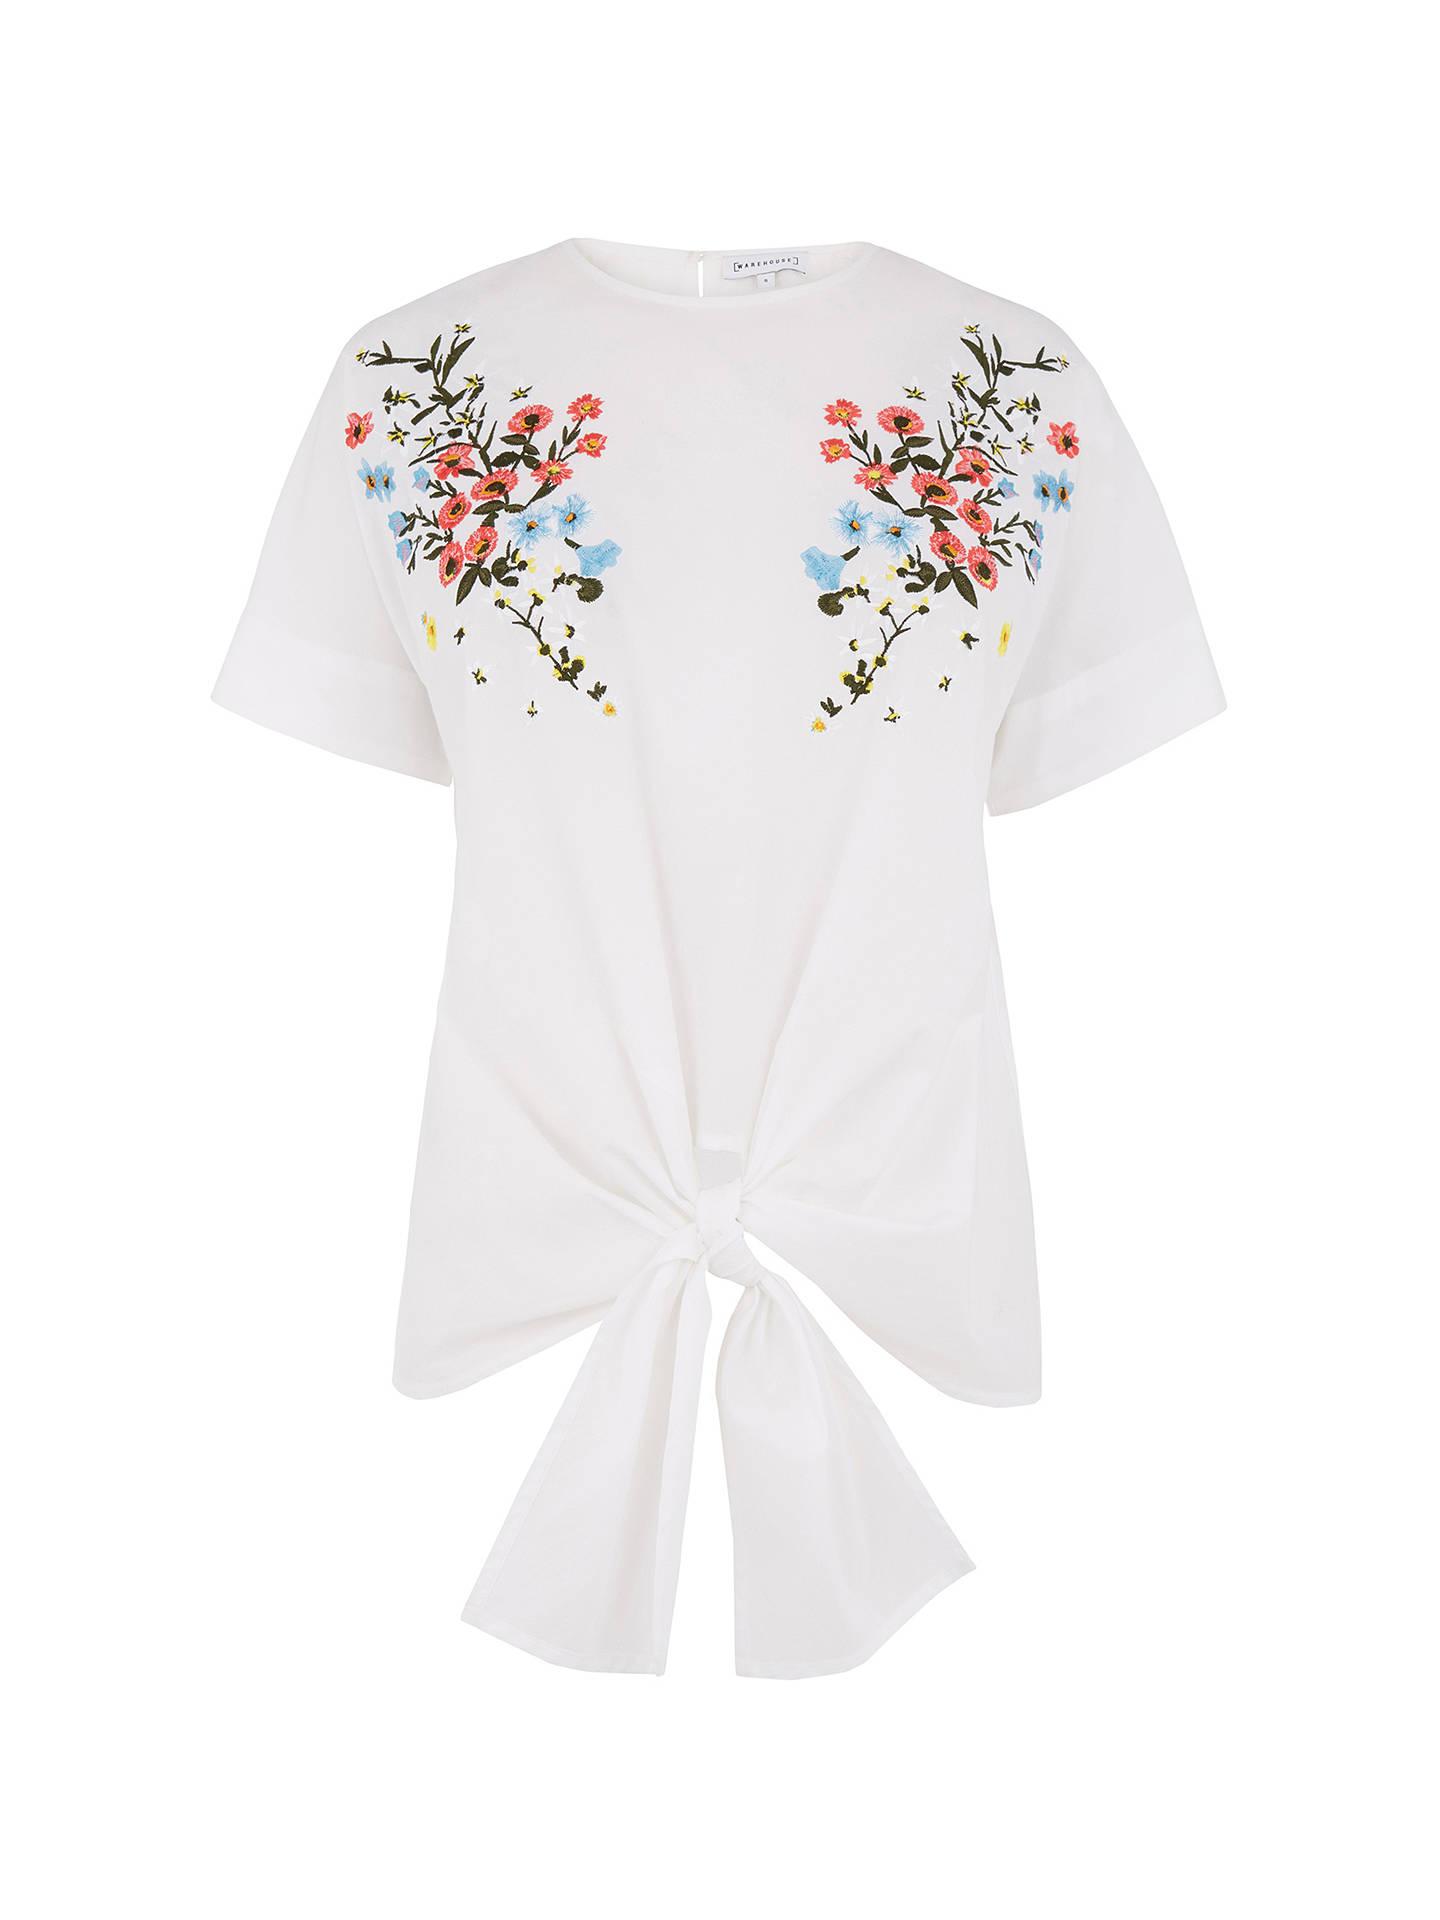 881de21c ... Buy Warehouse Frieda Embroidered Tie Top, White, 6 Online at  johnlewis.com ...